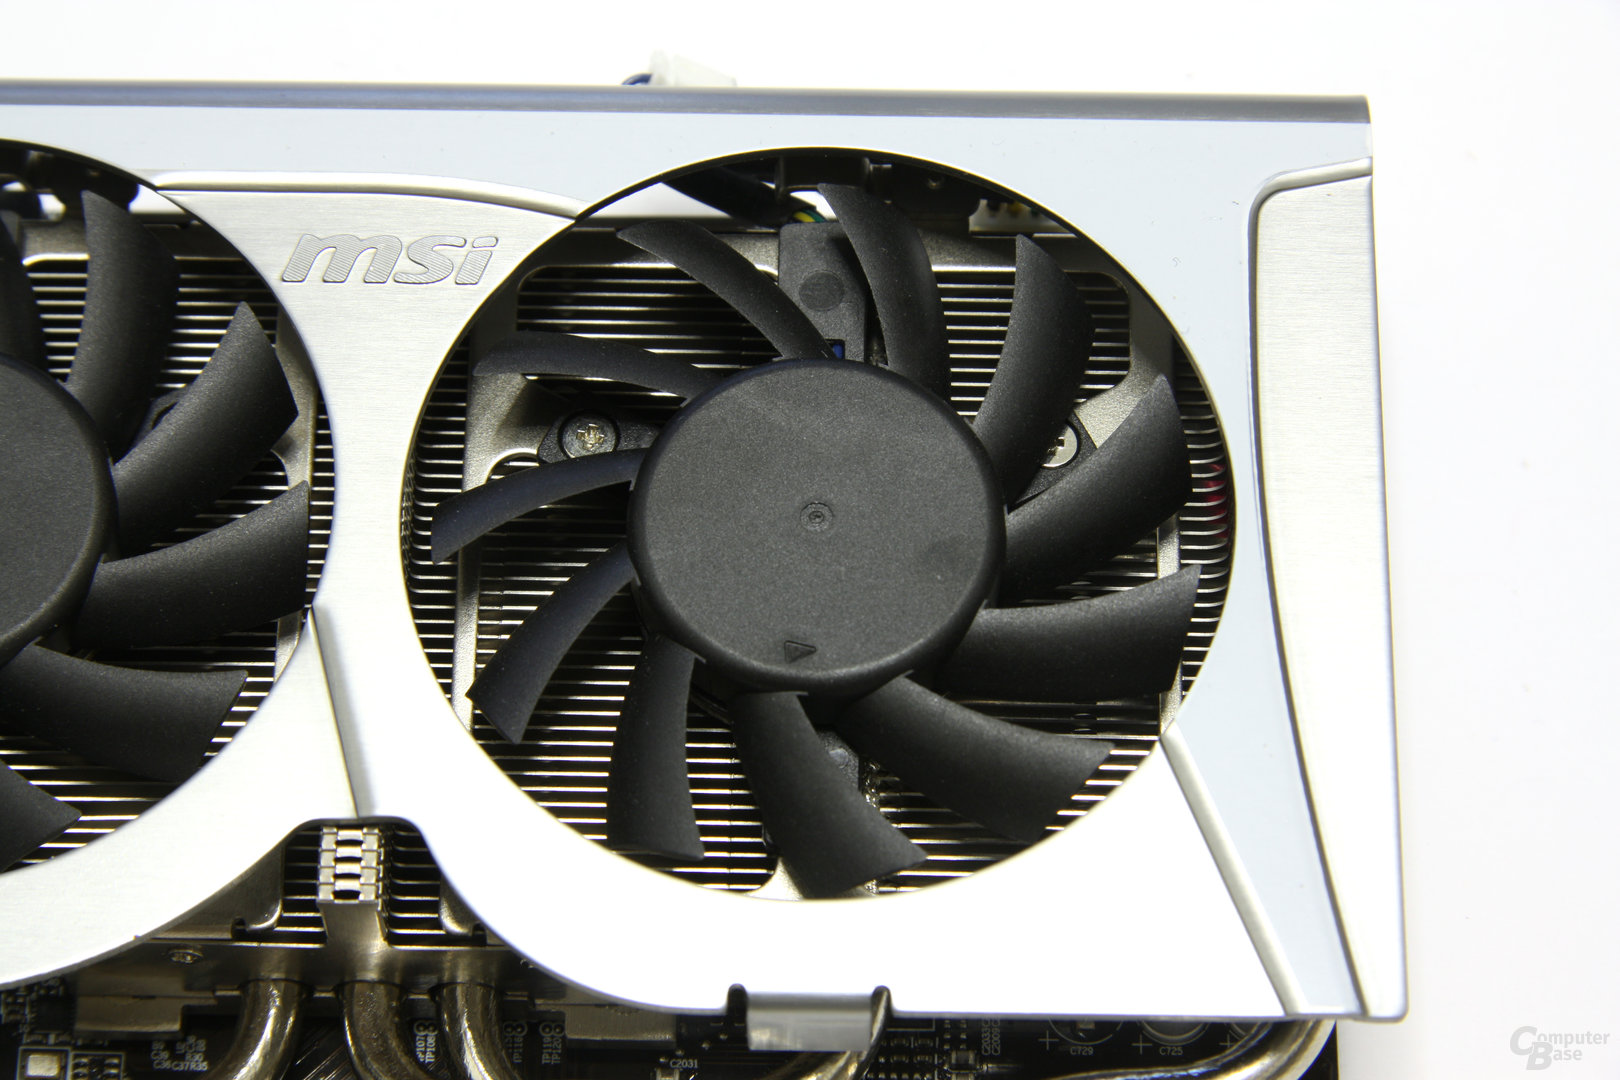 Radeon HD 5770 Hawk Lüfter